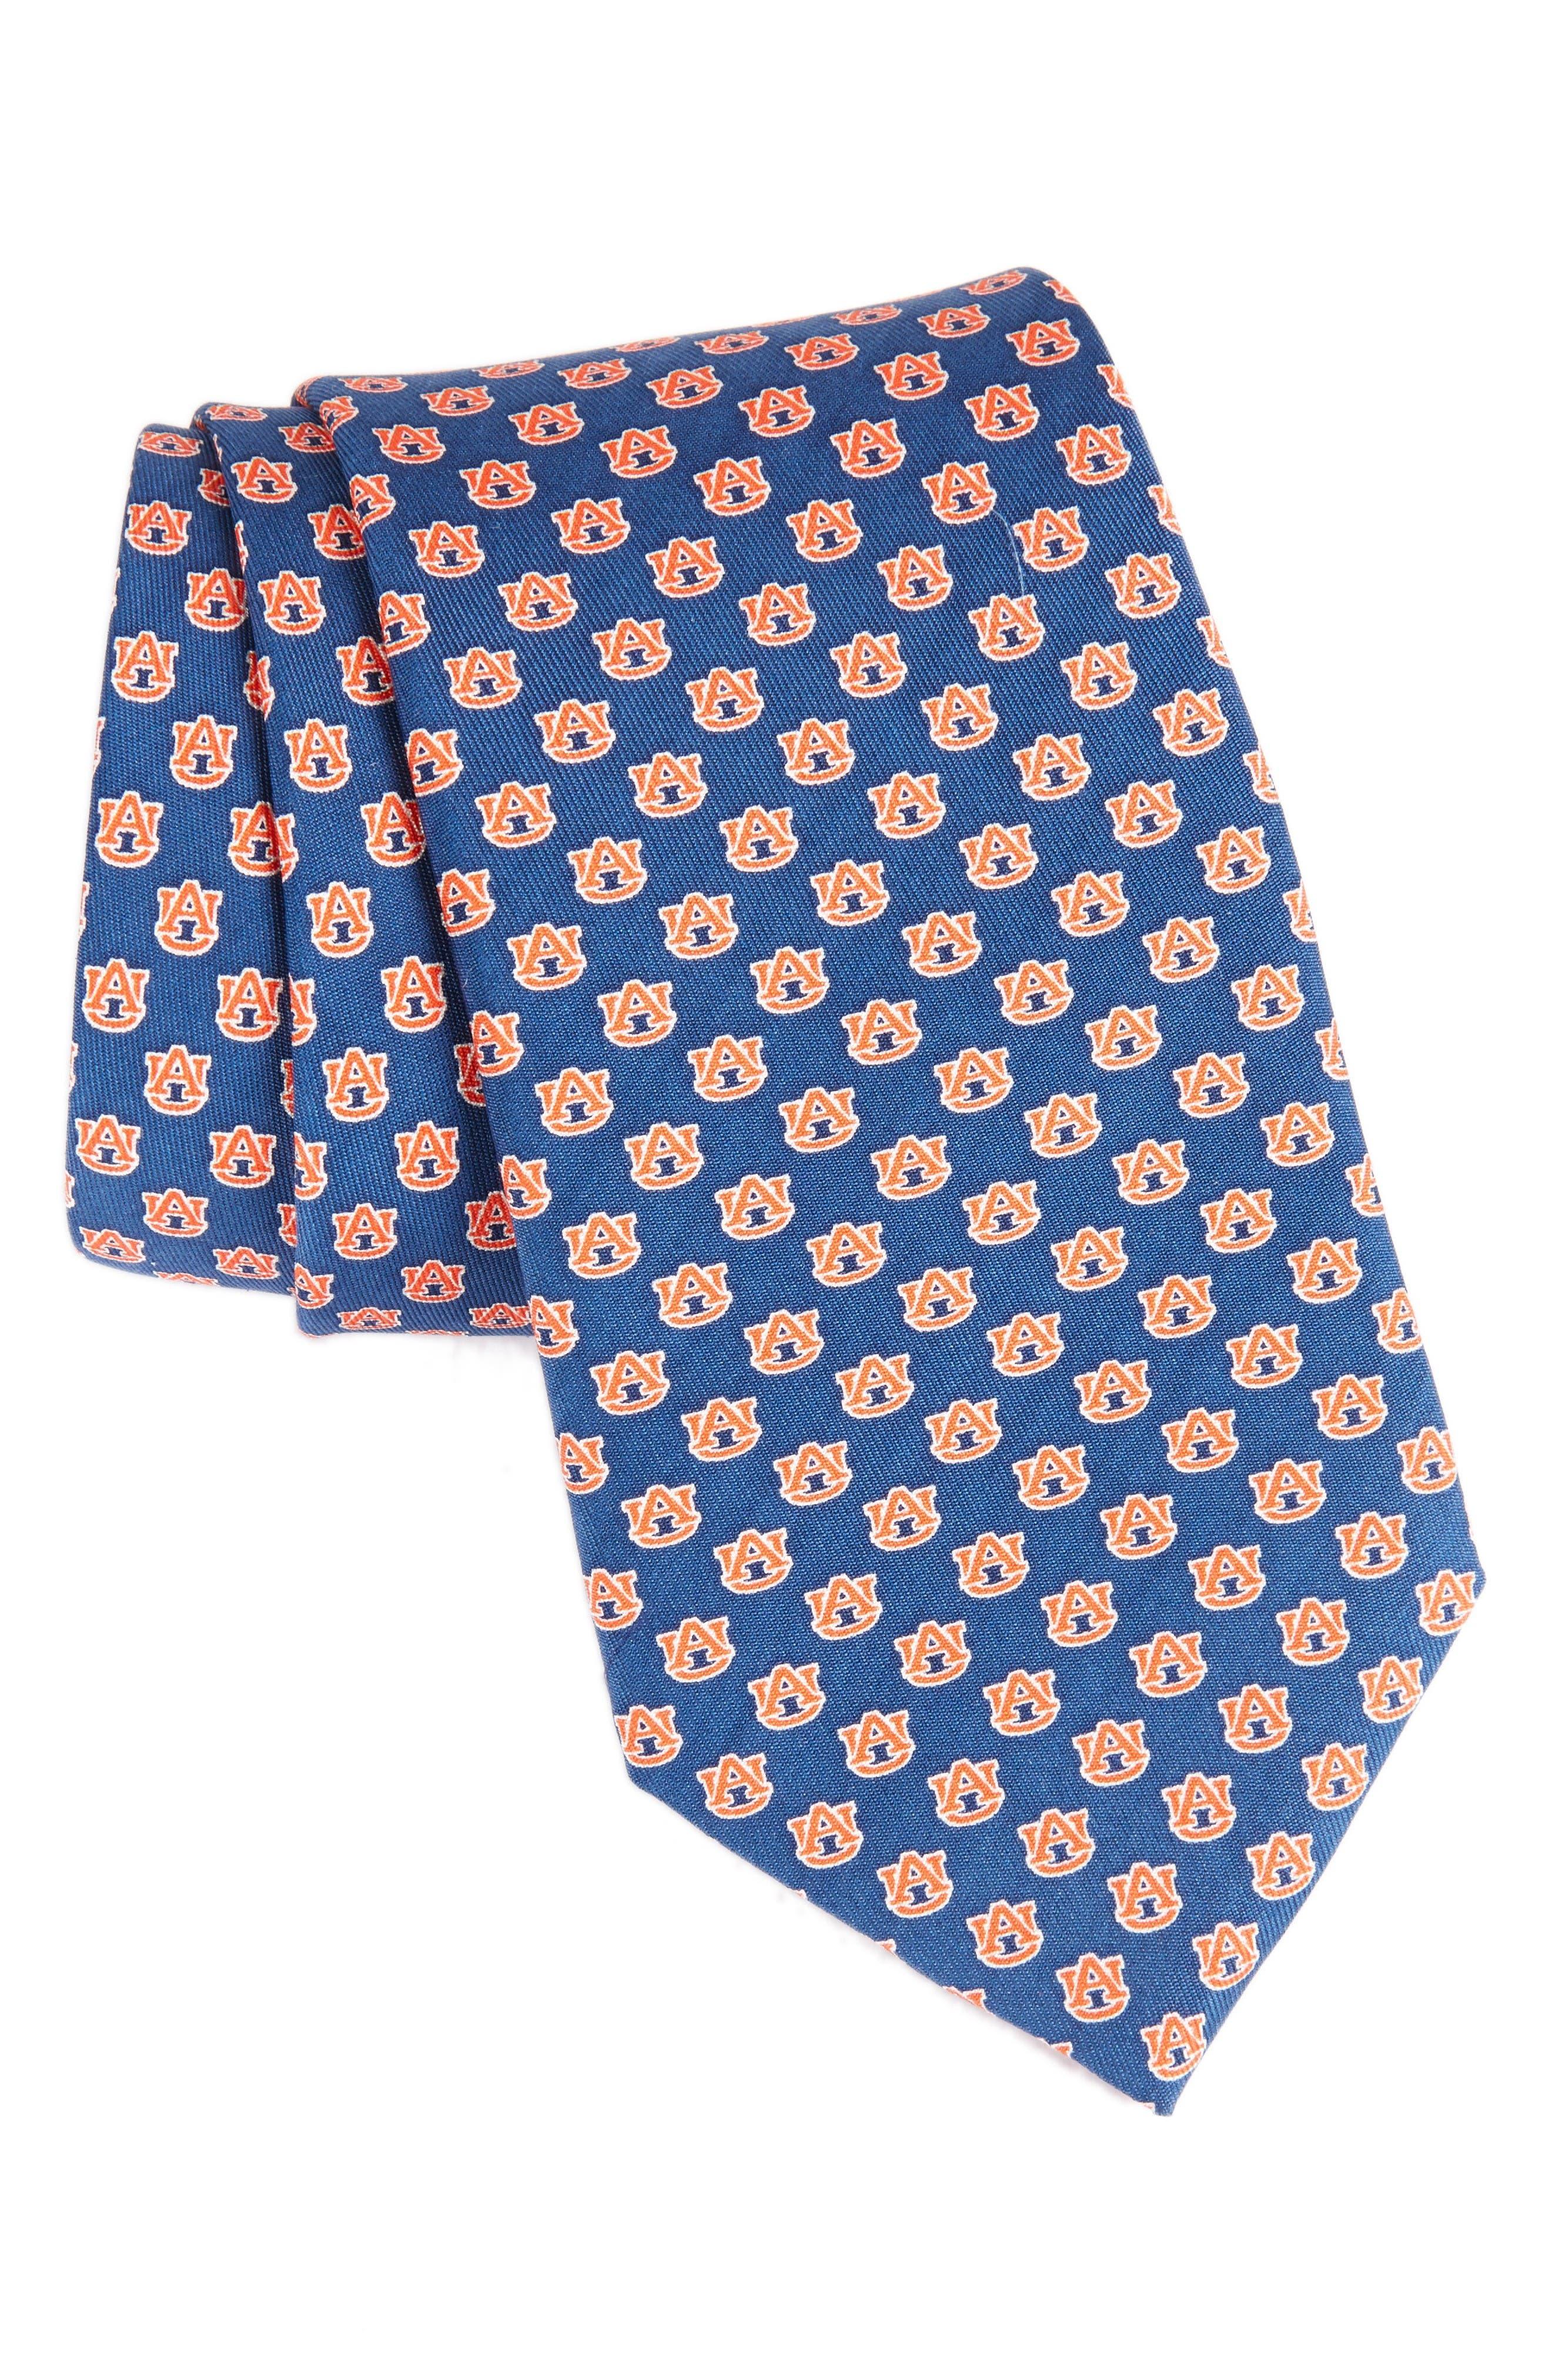 Auburn University Silk Tie,                             Main thumbnail 1, color,                             Vineyard Navy